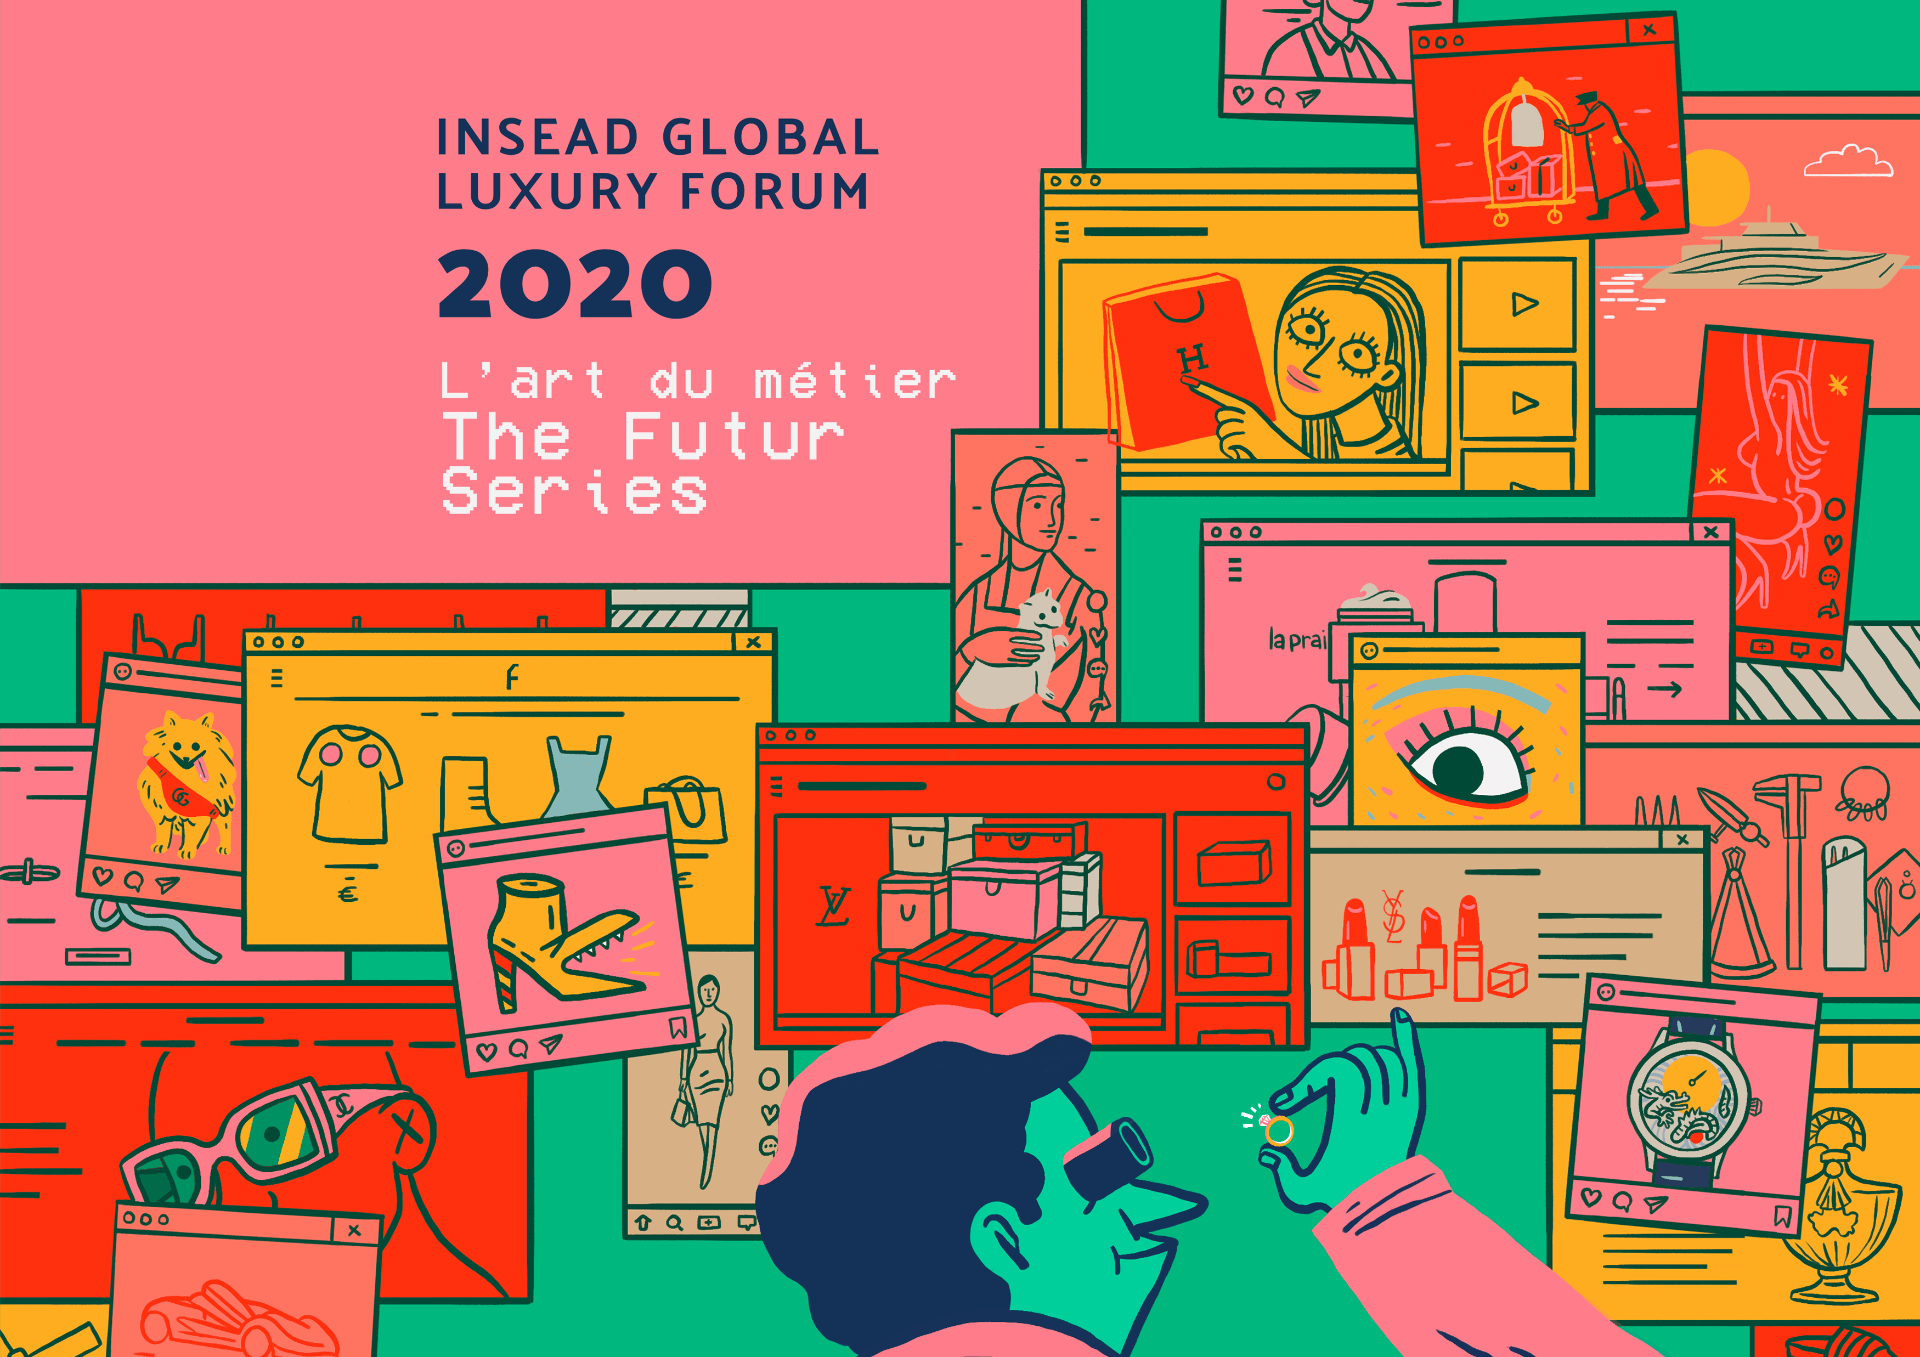 insead-global-luxury-day 2020